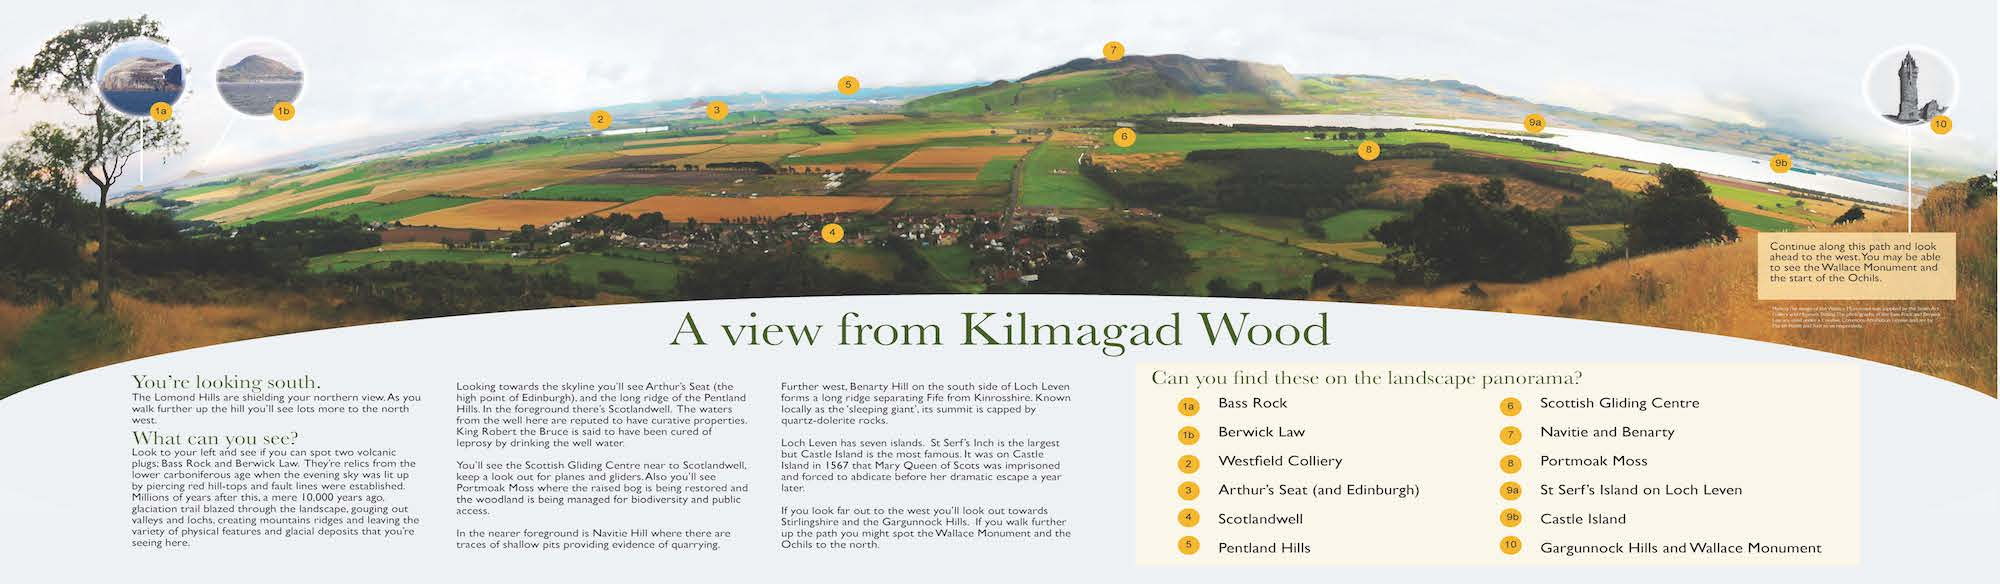 Final review copy Kilmagad VIB 1st Nov 2011-2